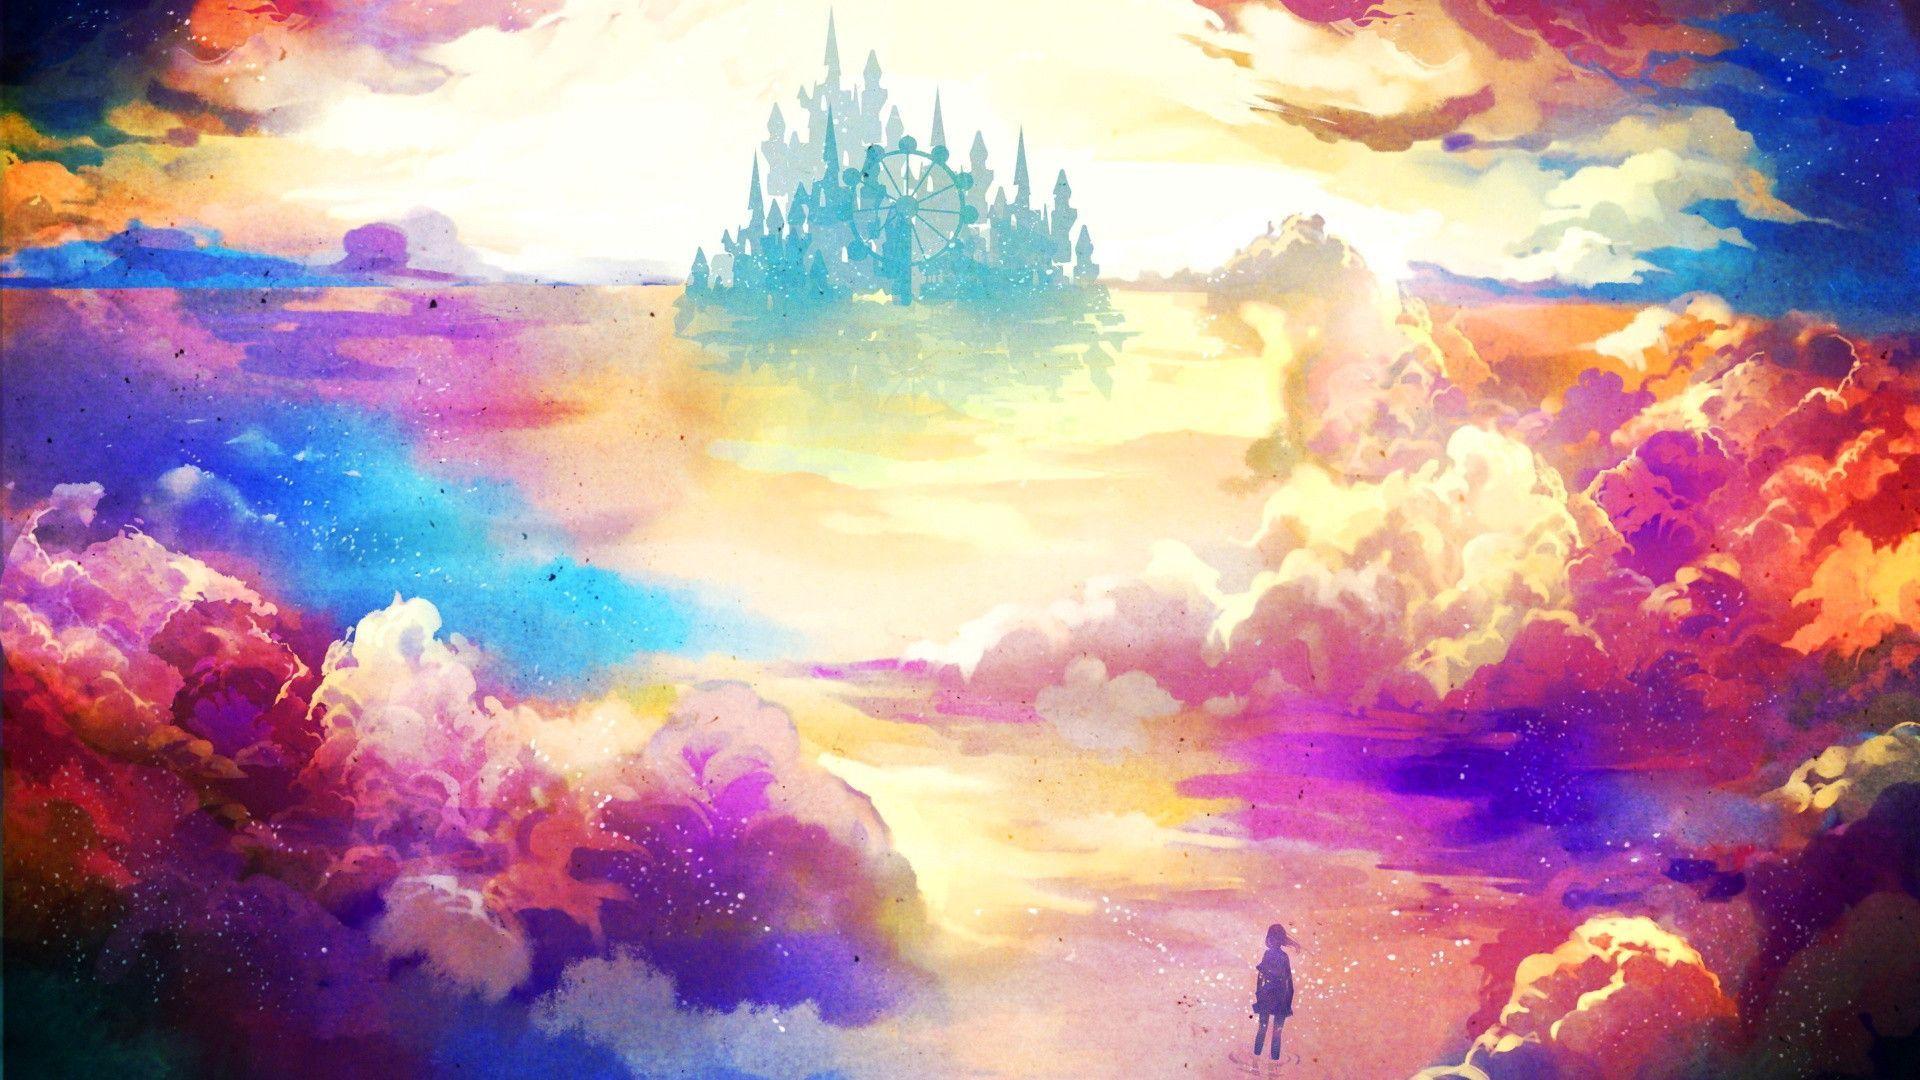 Fantasy World Wallpapers - Wallpaper Cave